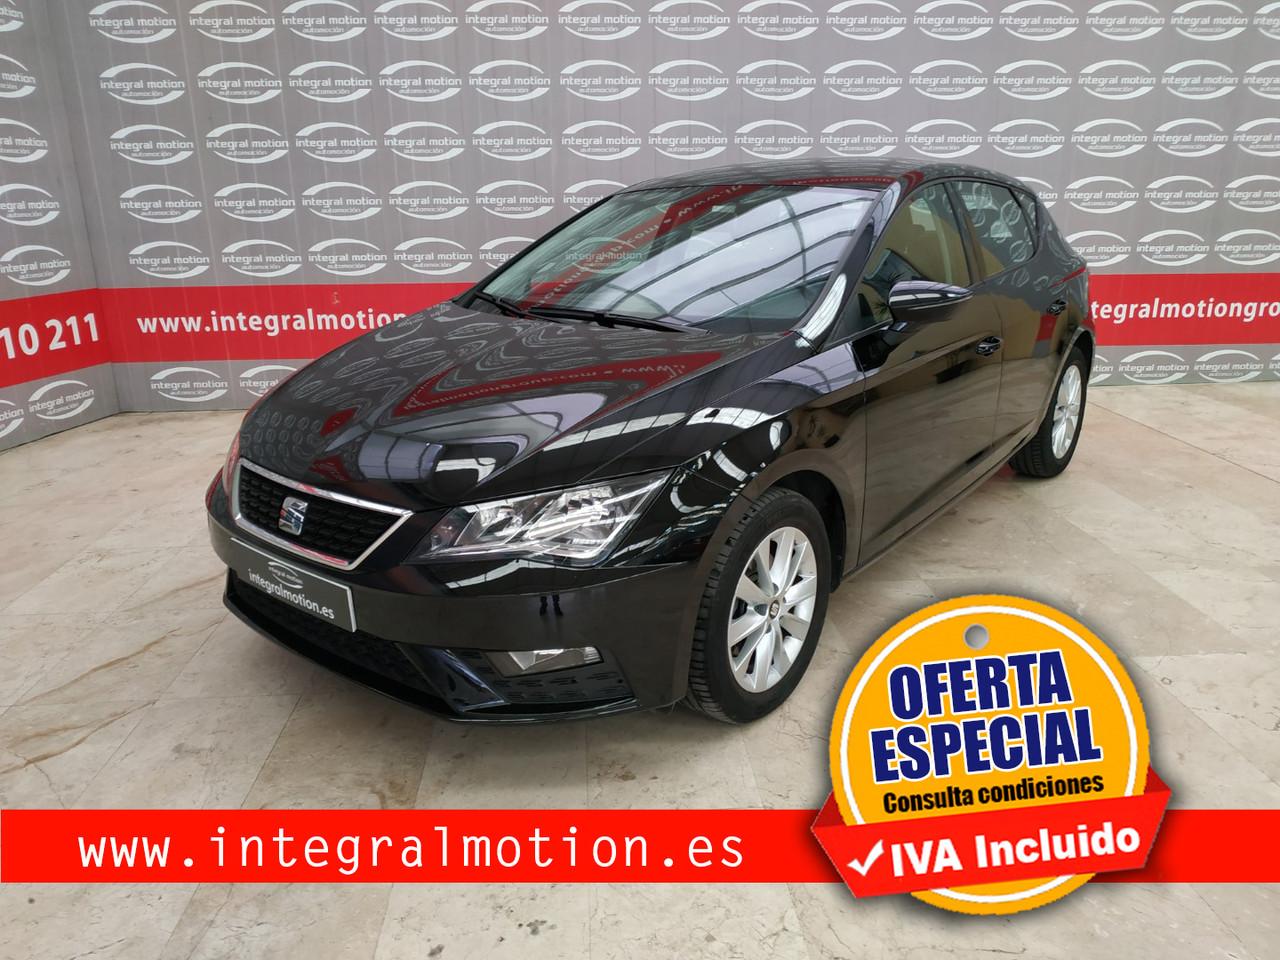 SEAT León 1.6 TDI 85kW (115CV) St&Sp Style  - Foto 1